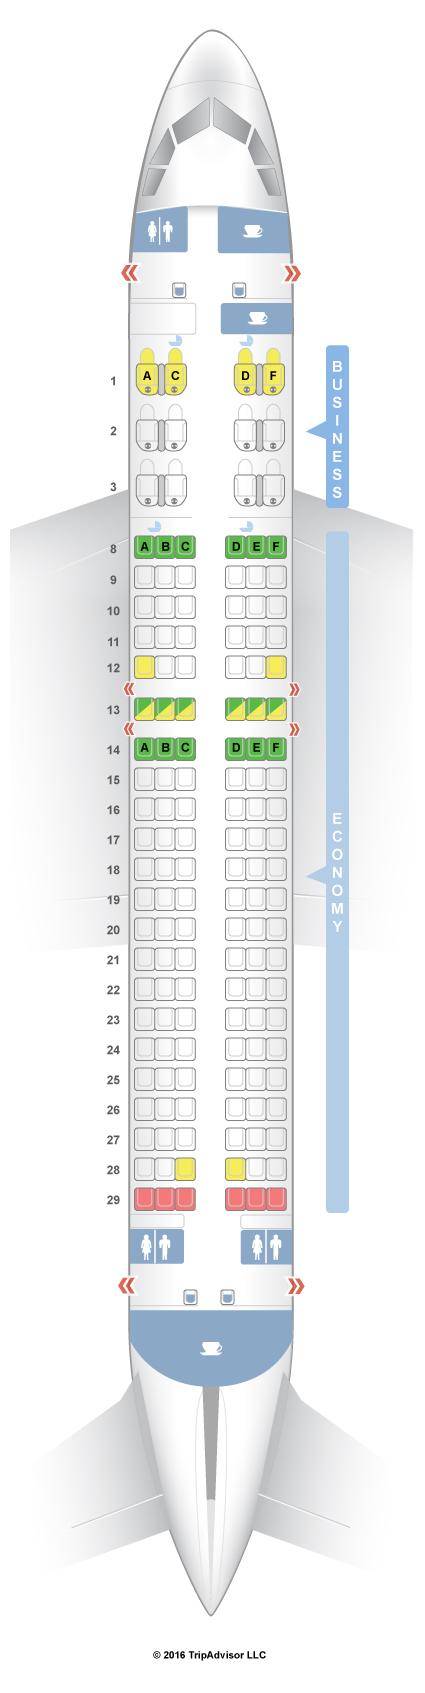 SeatGuru Seat Map Qatar Airways Airbus A320 (320) V1